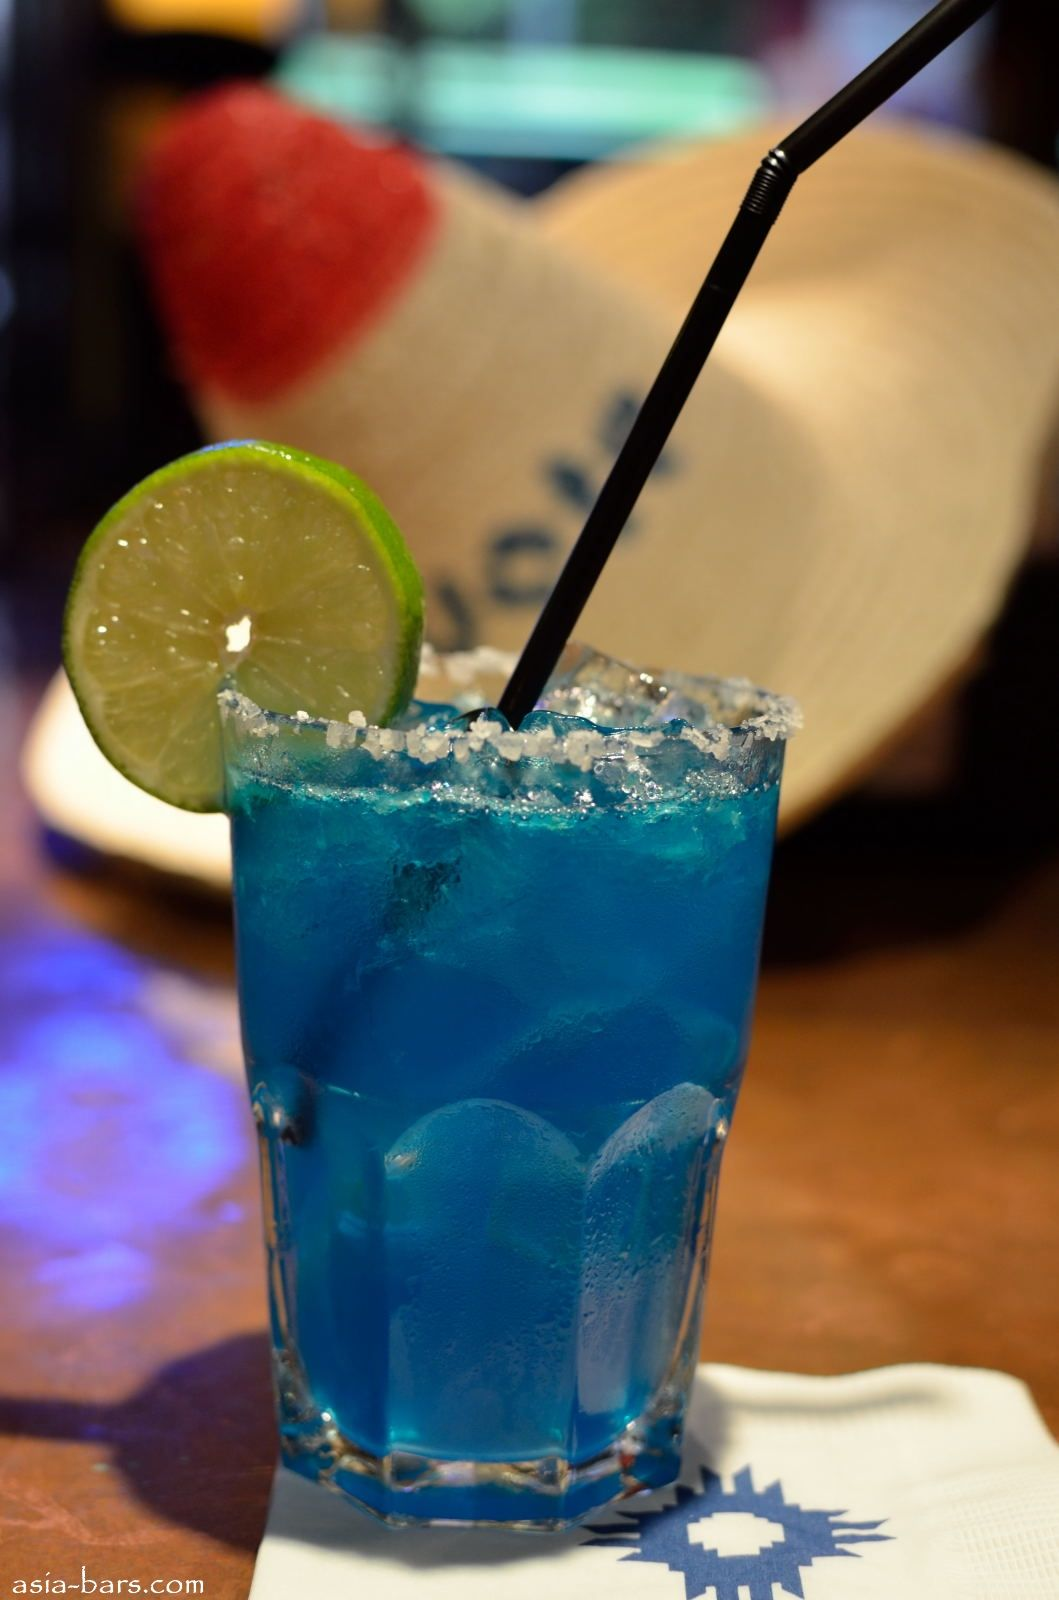 Island margarita cuervo tequila malibu rum triple sec for Party drinks with tequila